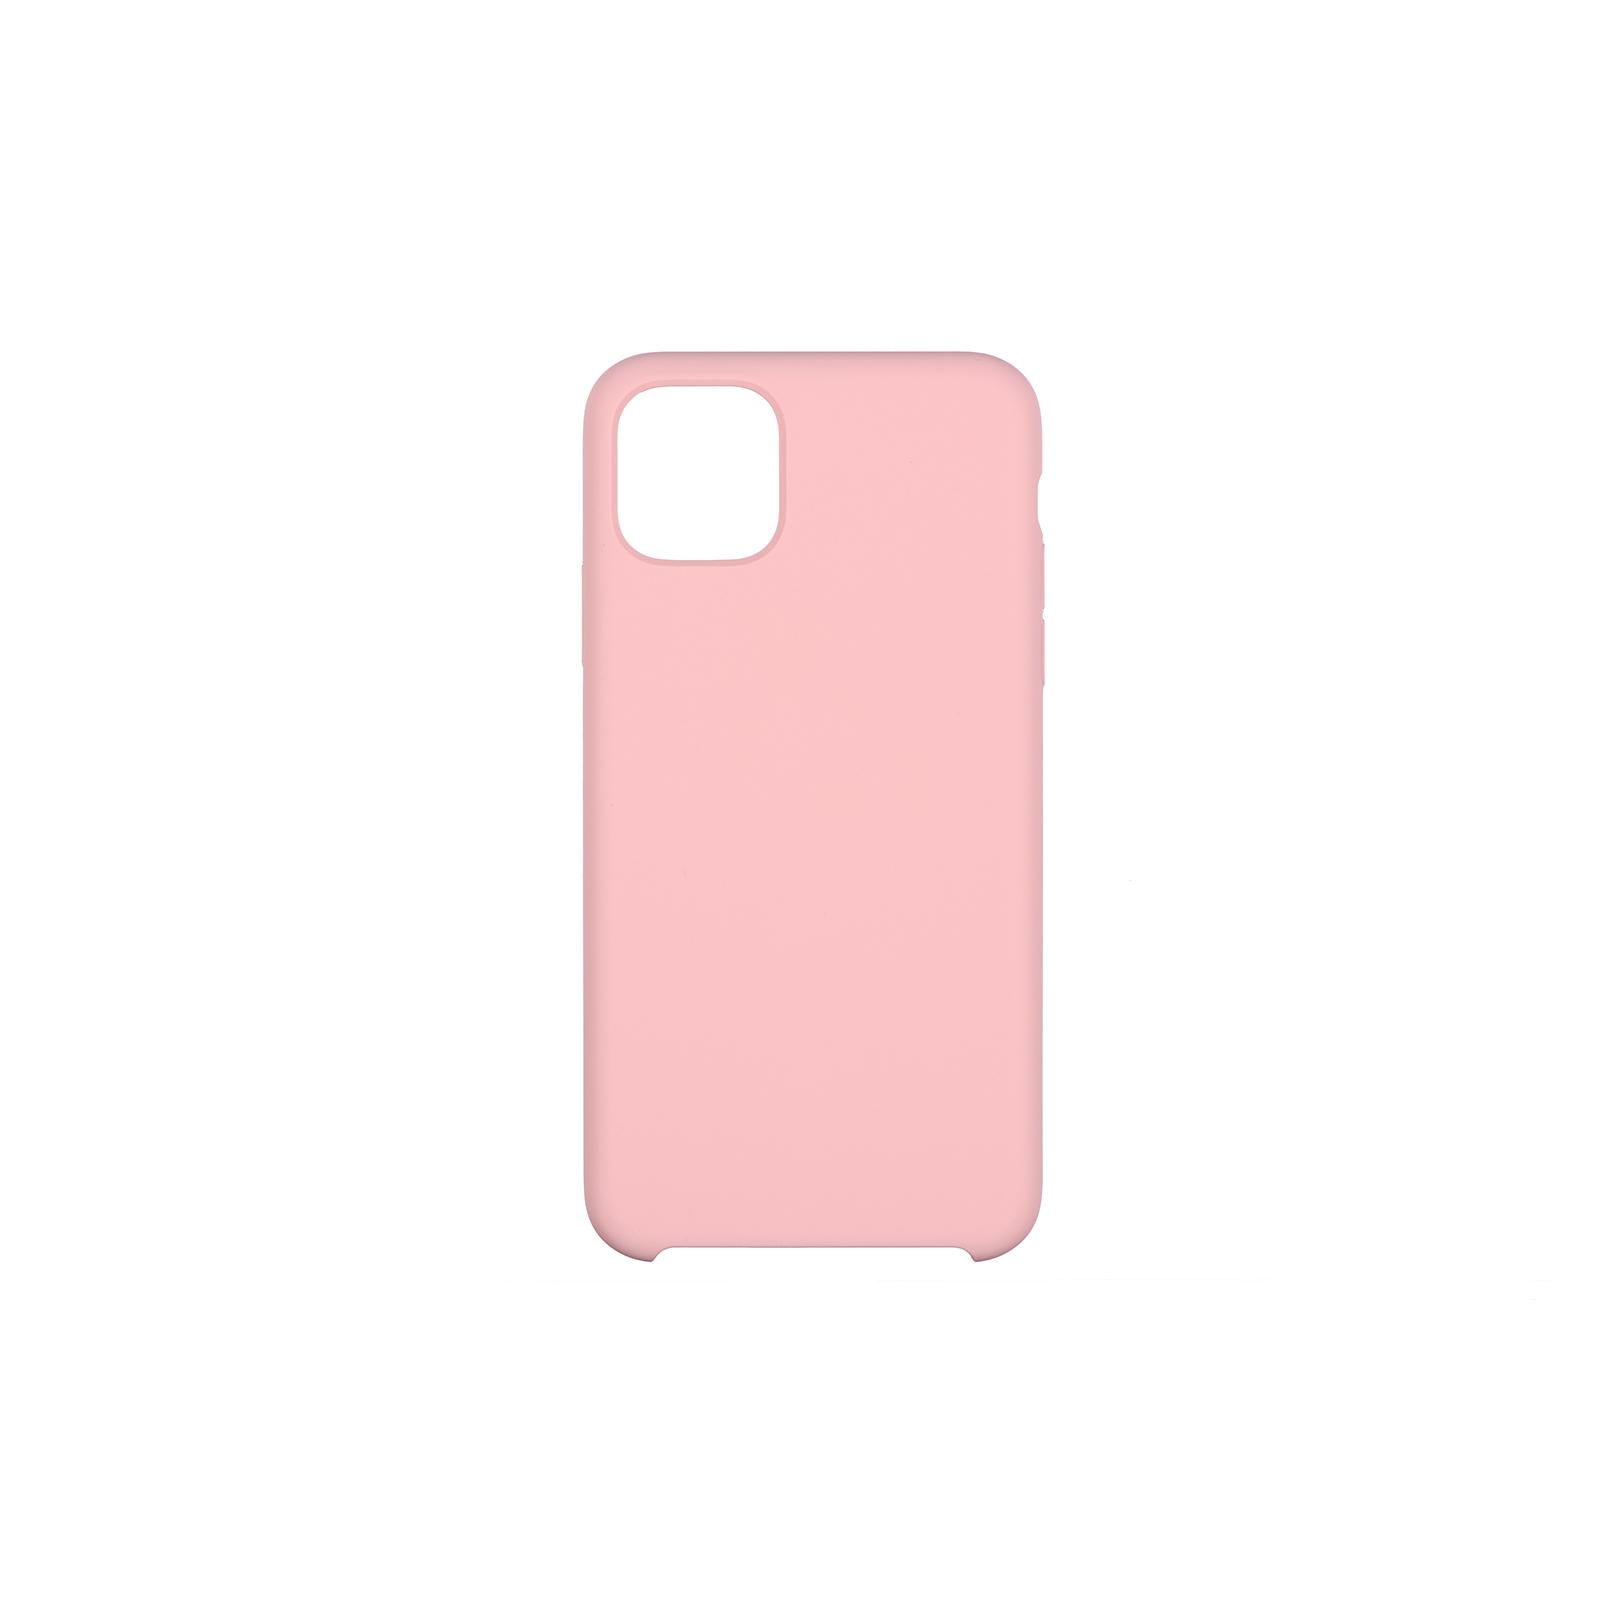 "Чехол для моб. телефона 2E Apple iPhone 11 (6.1""), Liquid Silicone, Pink (2E-IPH-11-OCLS-PK)"